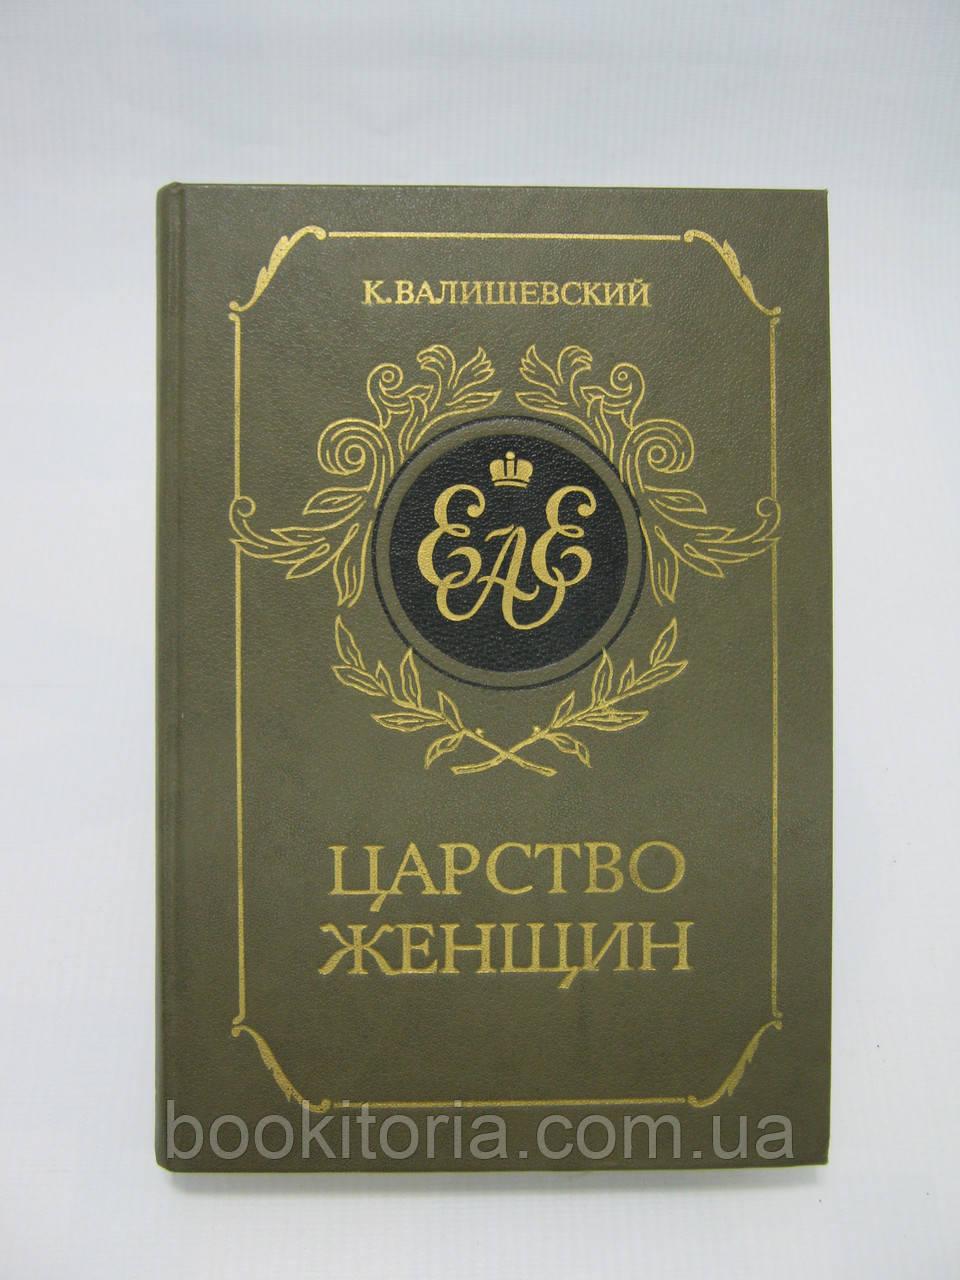 Валишевский К. Царство женщин (б/у).